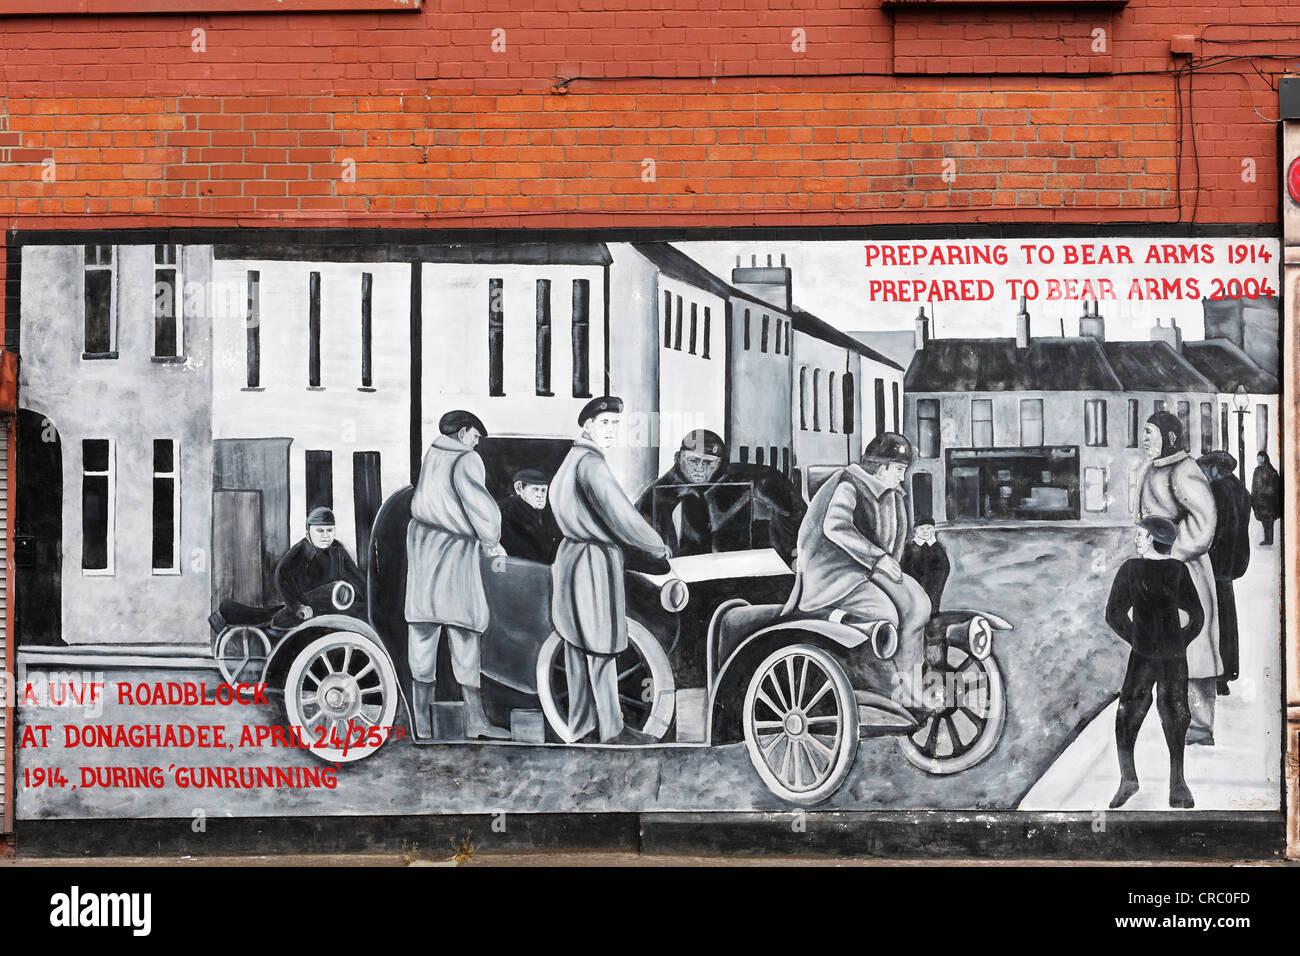 Protestant mural, Shankill Road, West Belfast, Belfast, Northern Ireland, United Kingdom, Europe, PublicGround - Stock Image